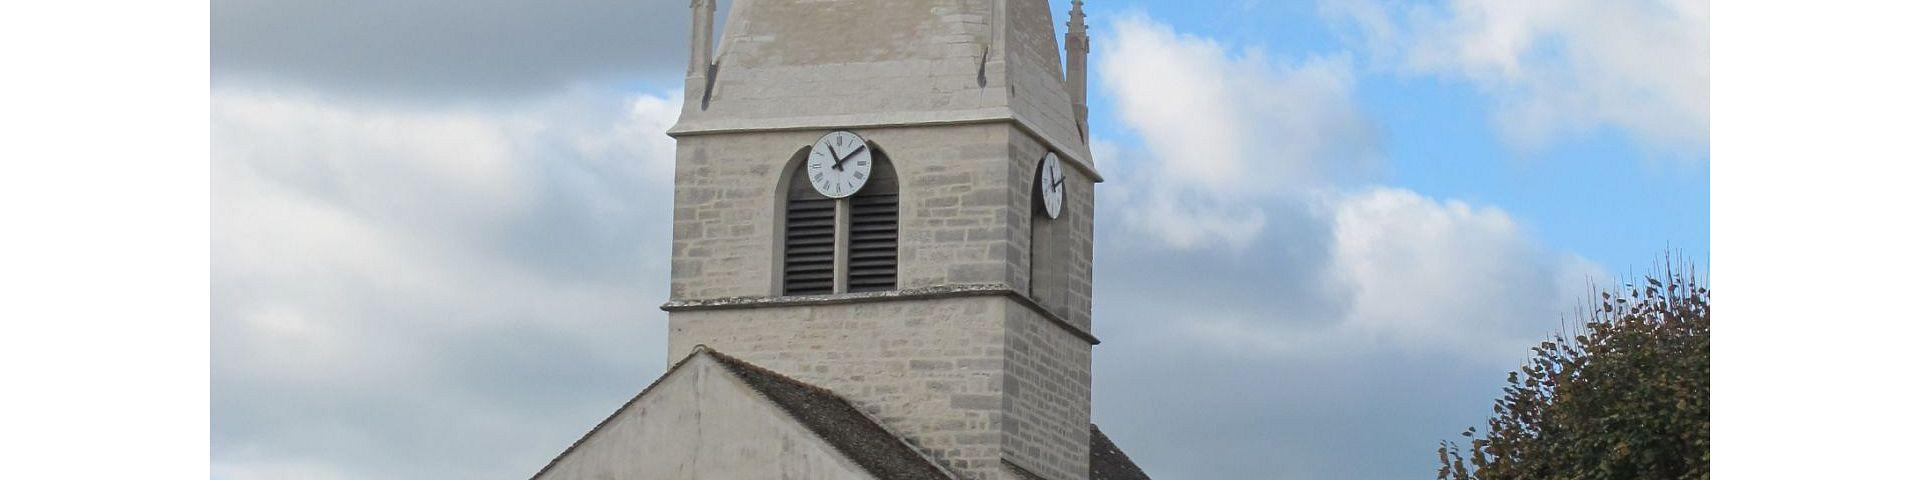 Auxey-Duresses - Eglise St-Martin (21)